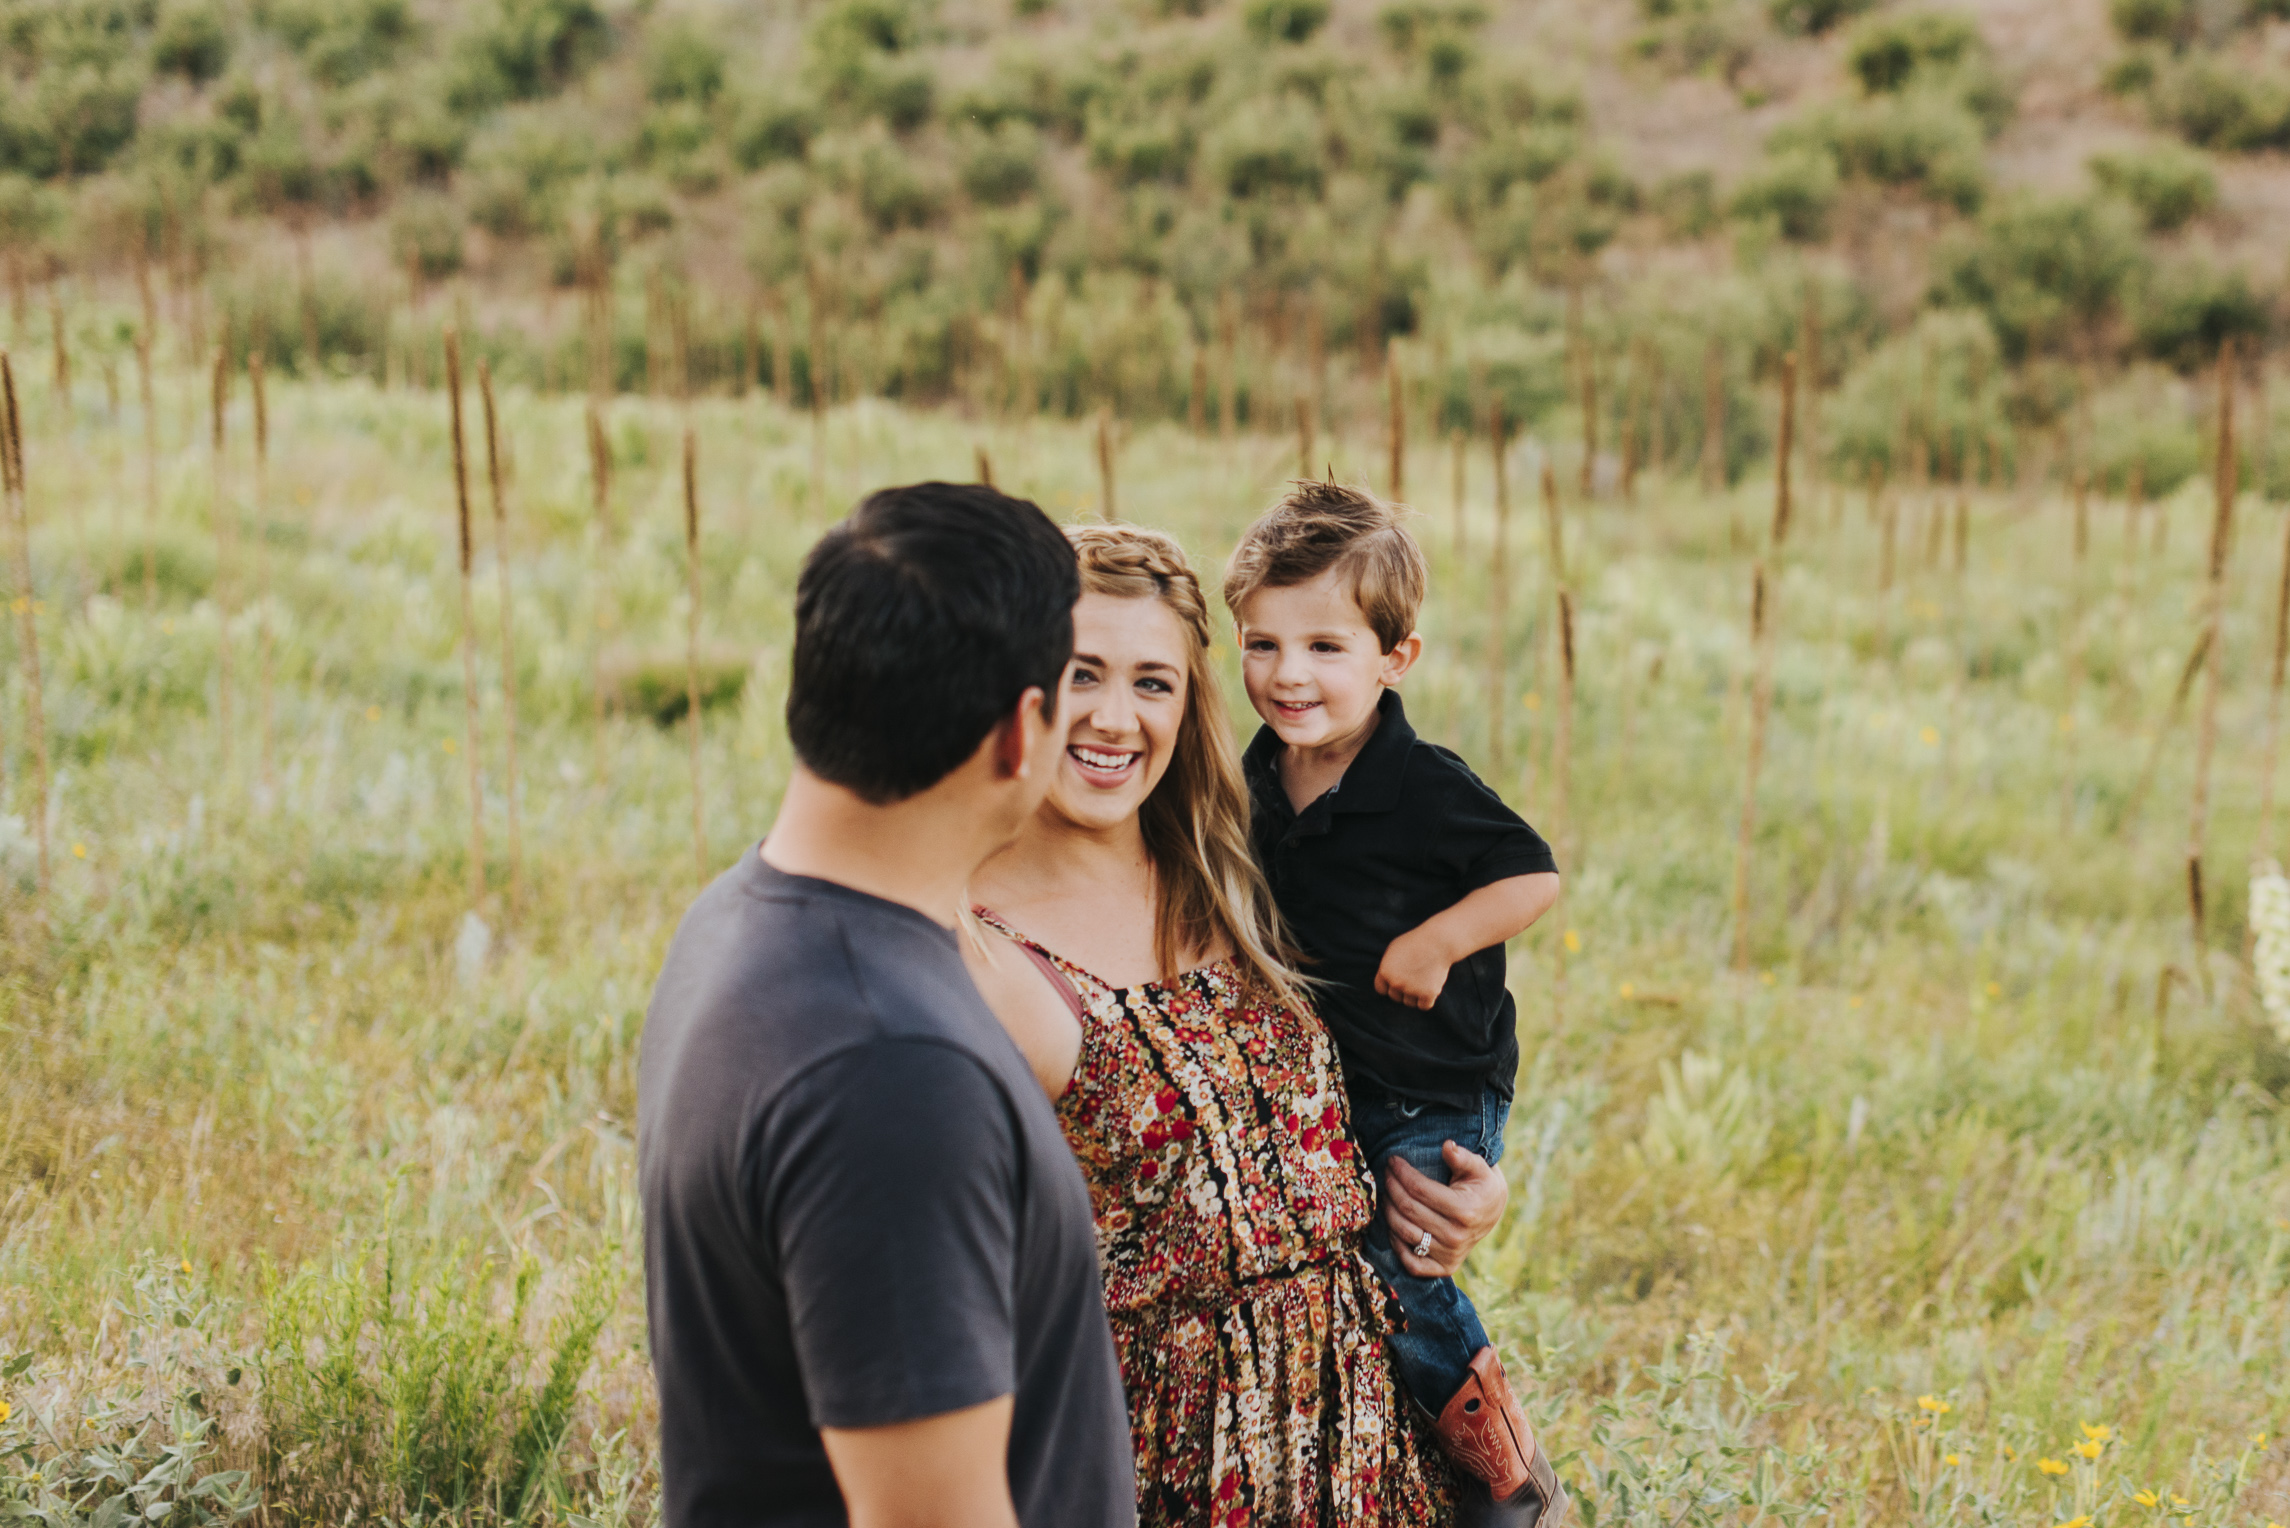 060716 webJAKE & MCKENNA FAMILY PHOTOS - COLORADO PHOTOGRAPHER - DEBI RAE PHOTOGRAPHY-5457.jpg